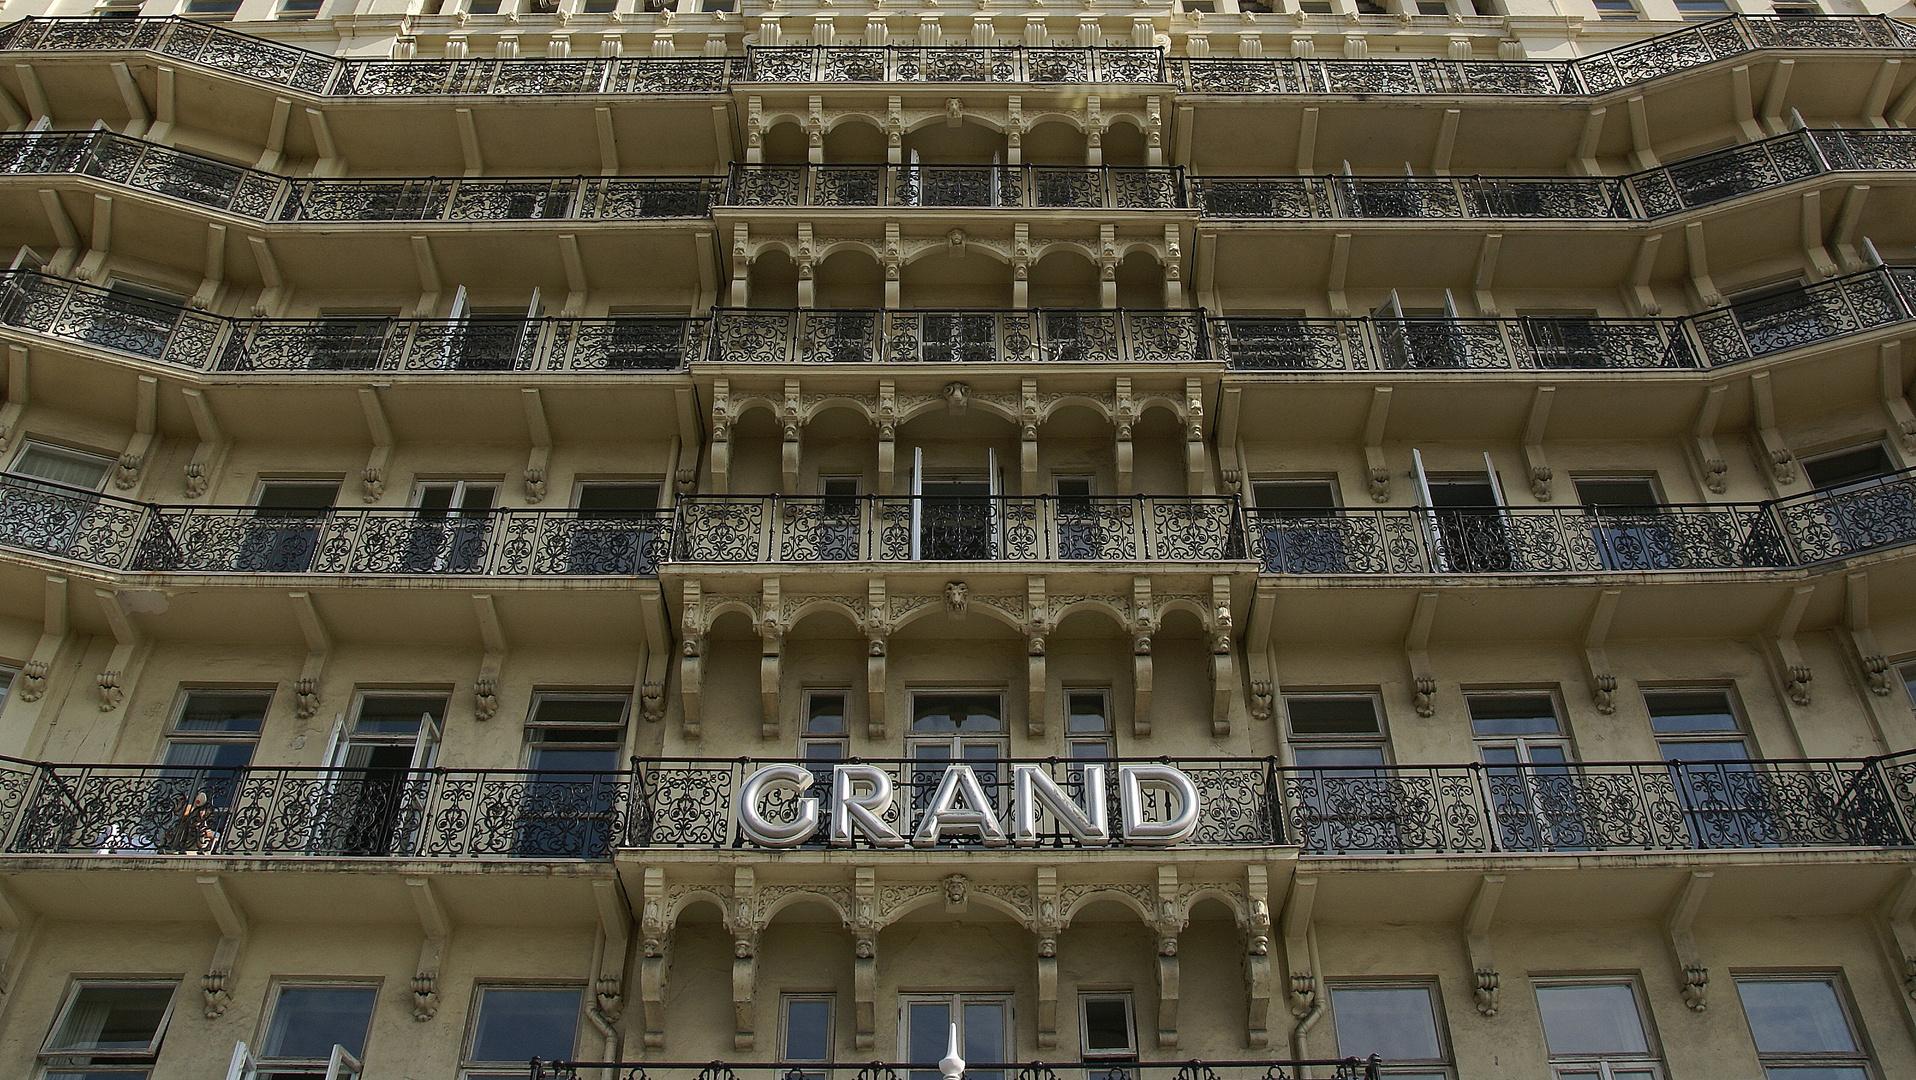 Brighton Grand Hotel Foto Bild Europe United Kingdom Ireland England Bilder Auf Fotocommunity